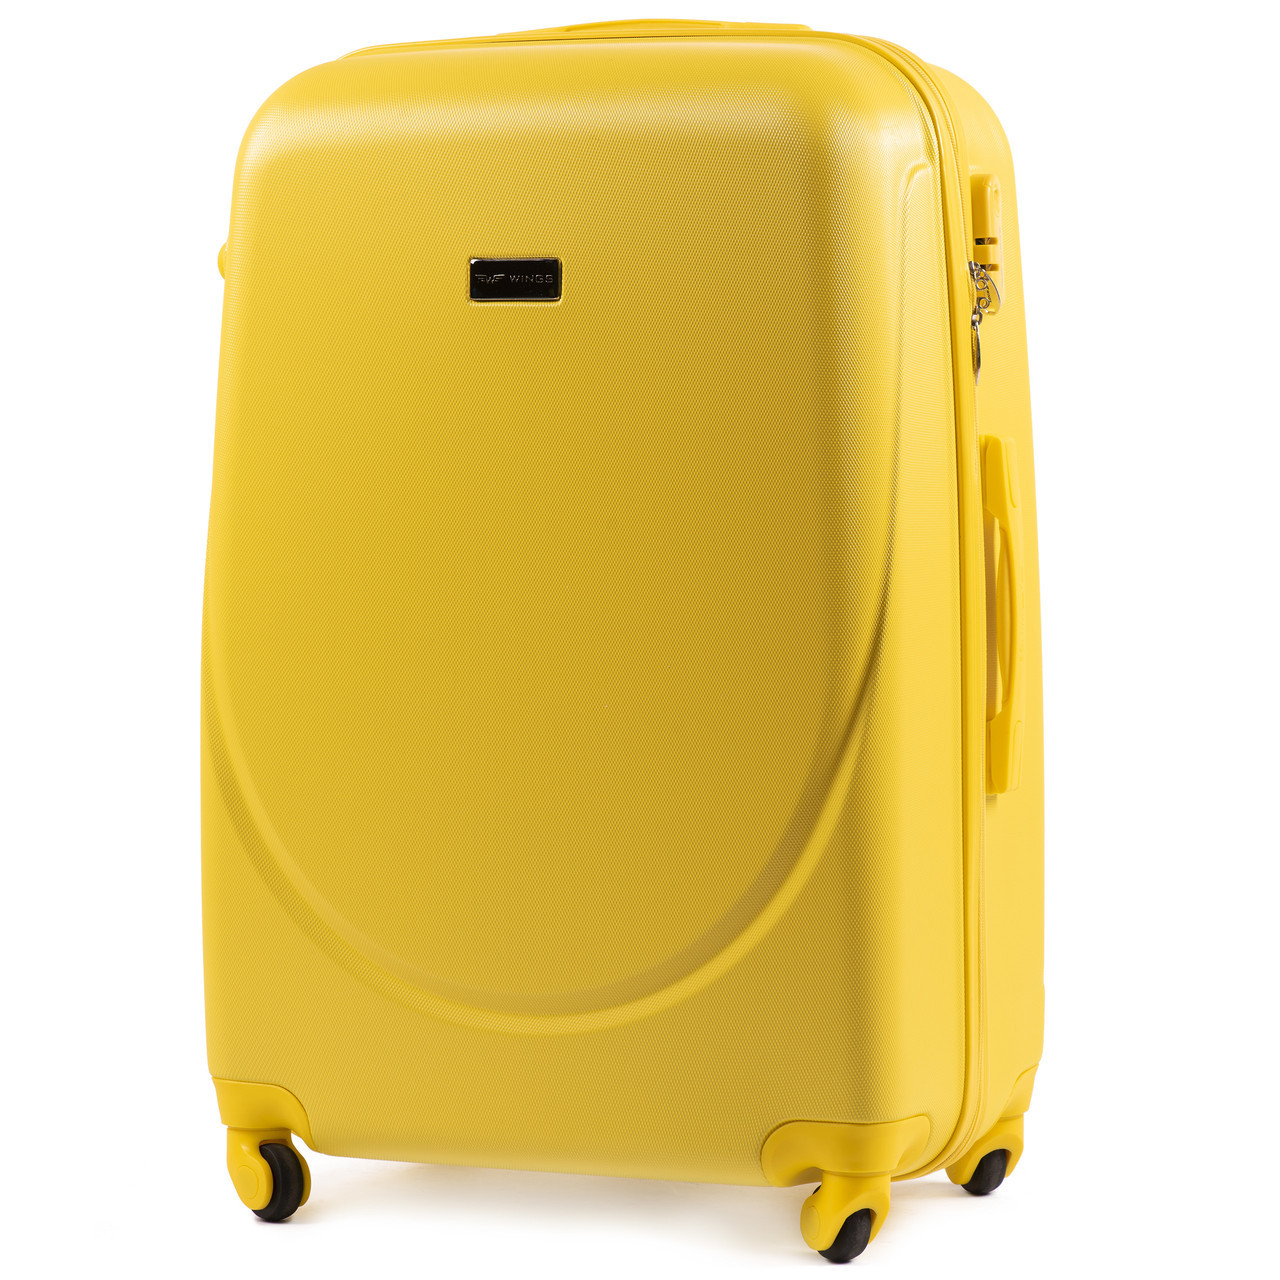 Чемодан Wings K310 большой 75х47х29 см 86л пластиковый на 4 колесах Желтый